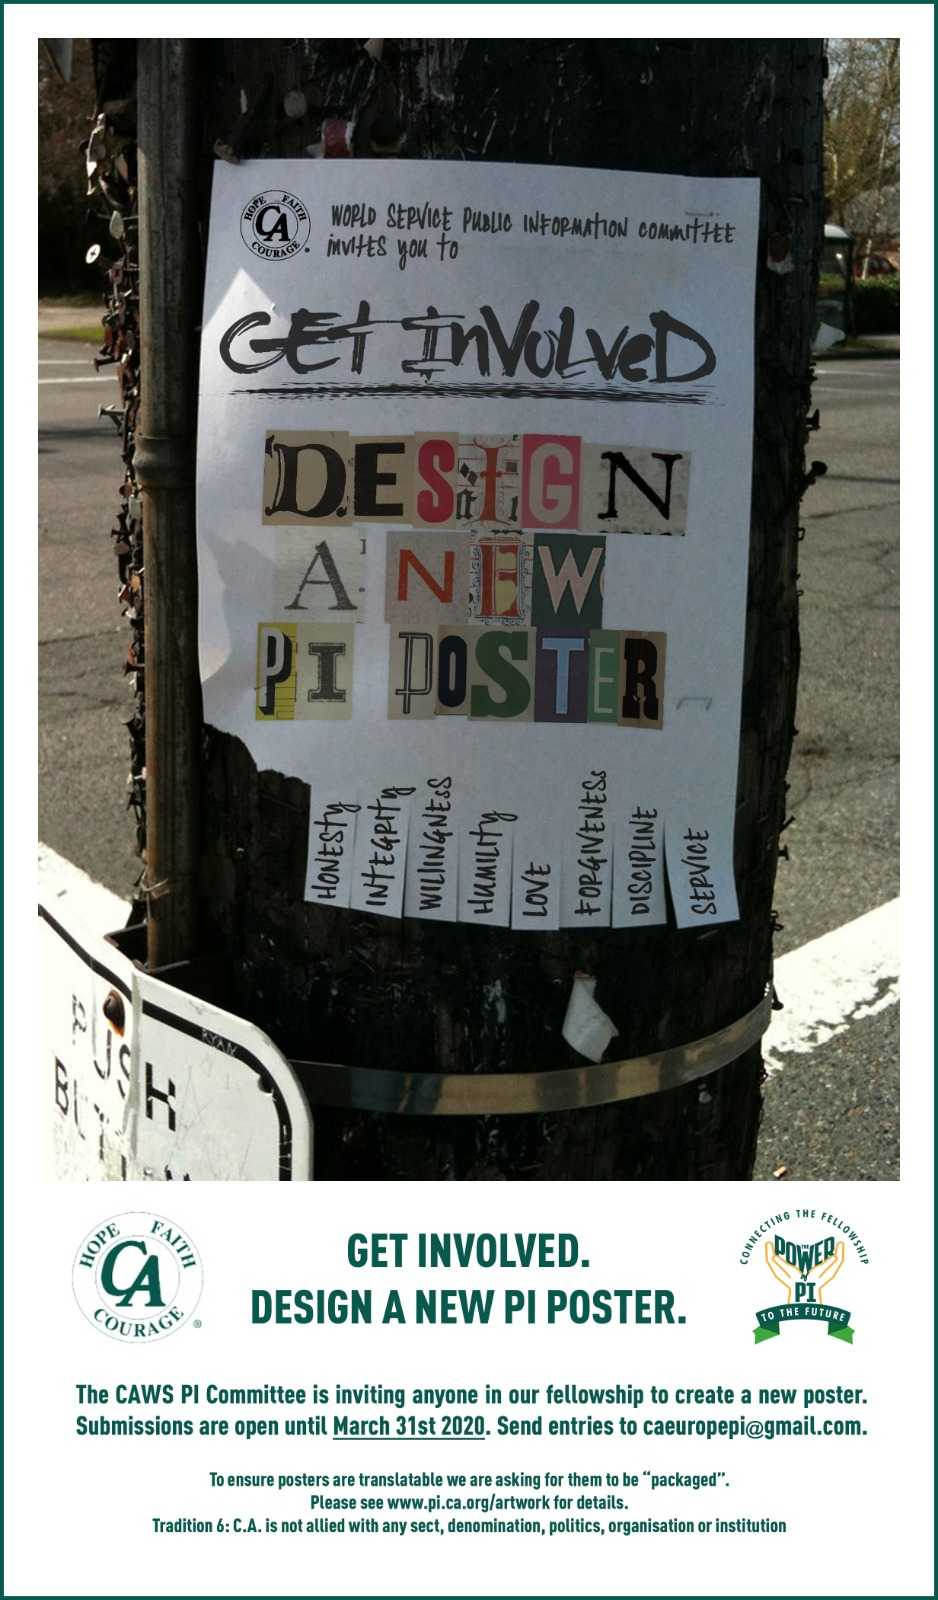 Design a New Poster